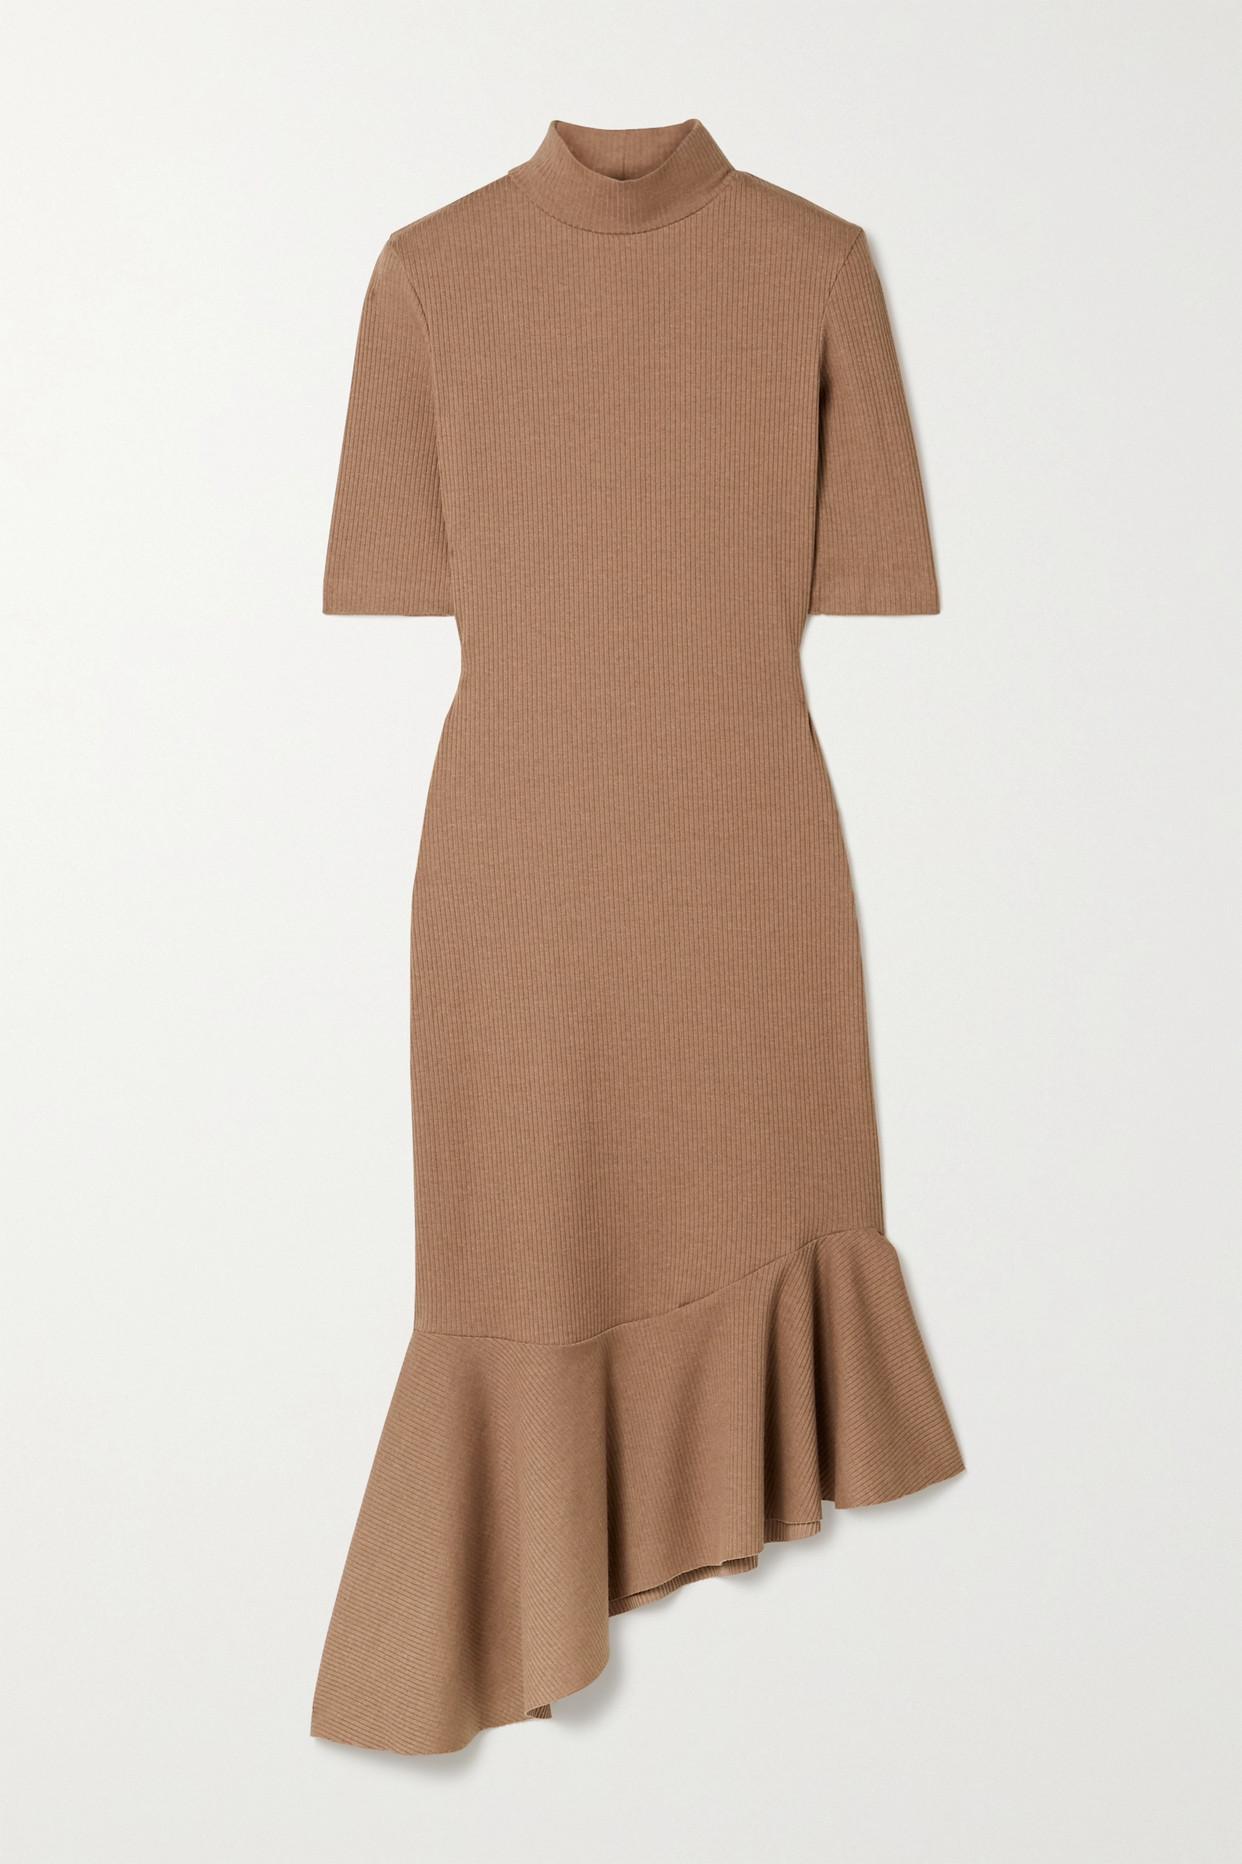 AAIZÉL - + Net Sustain Asymmetric Ruffled Ribbed-knit Midi Dress - Brown - large